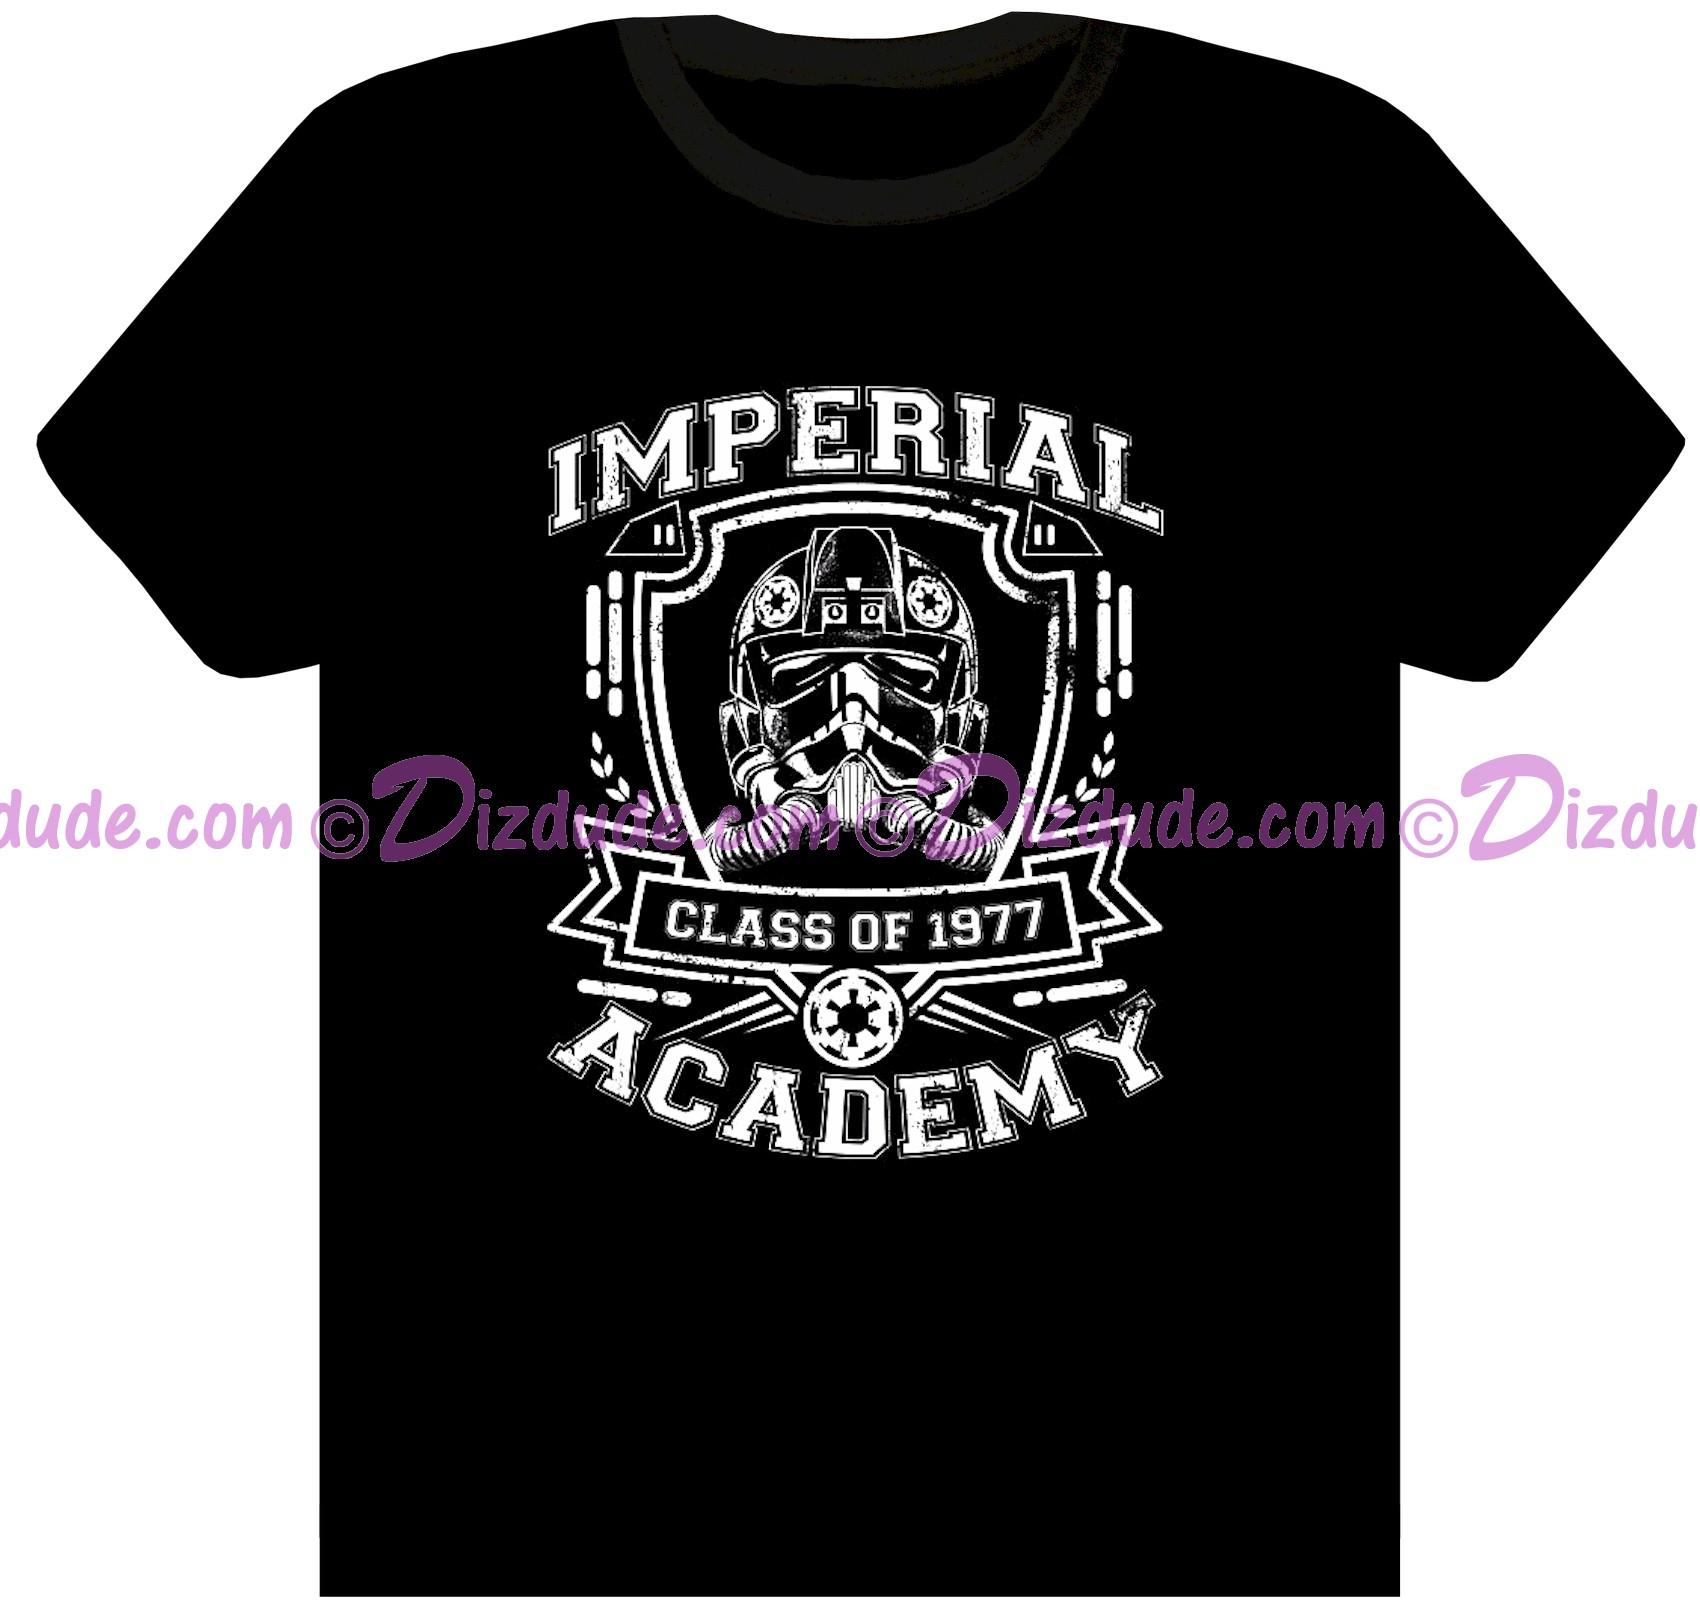 dizdude wars tie pilot imperial academy class of 1977